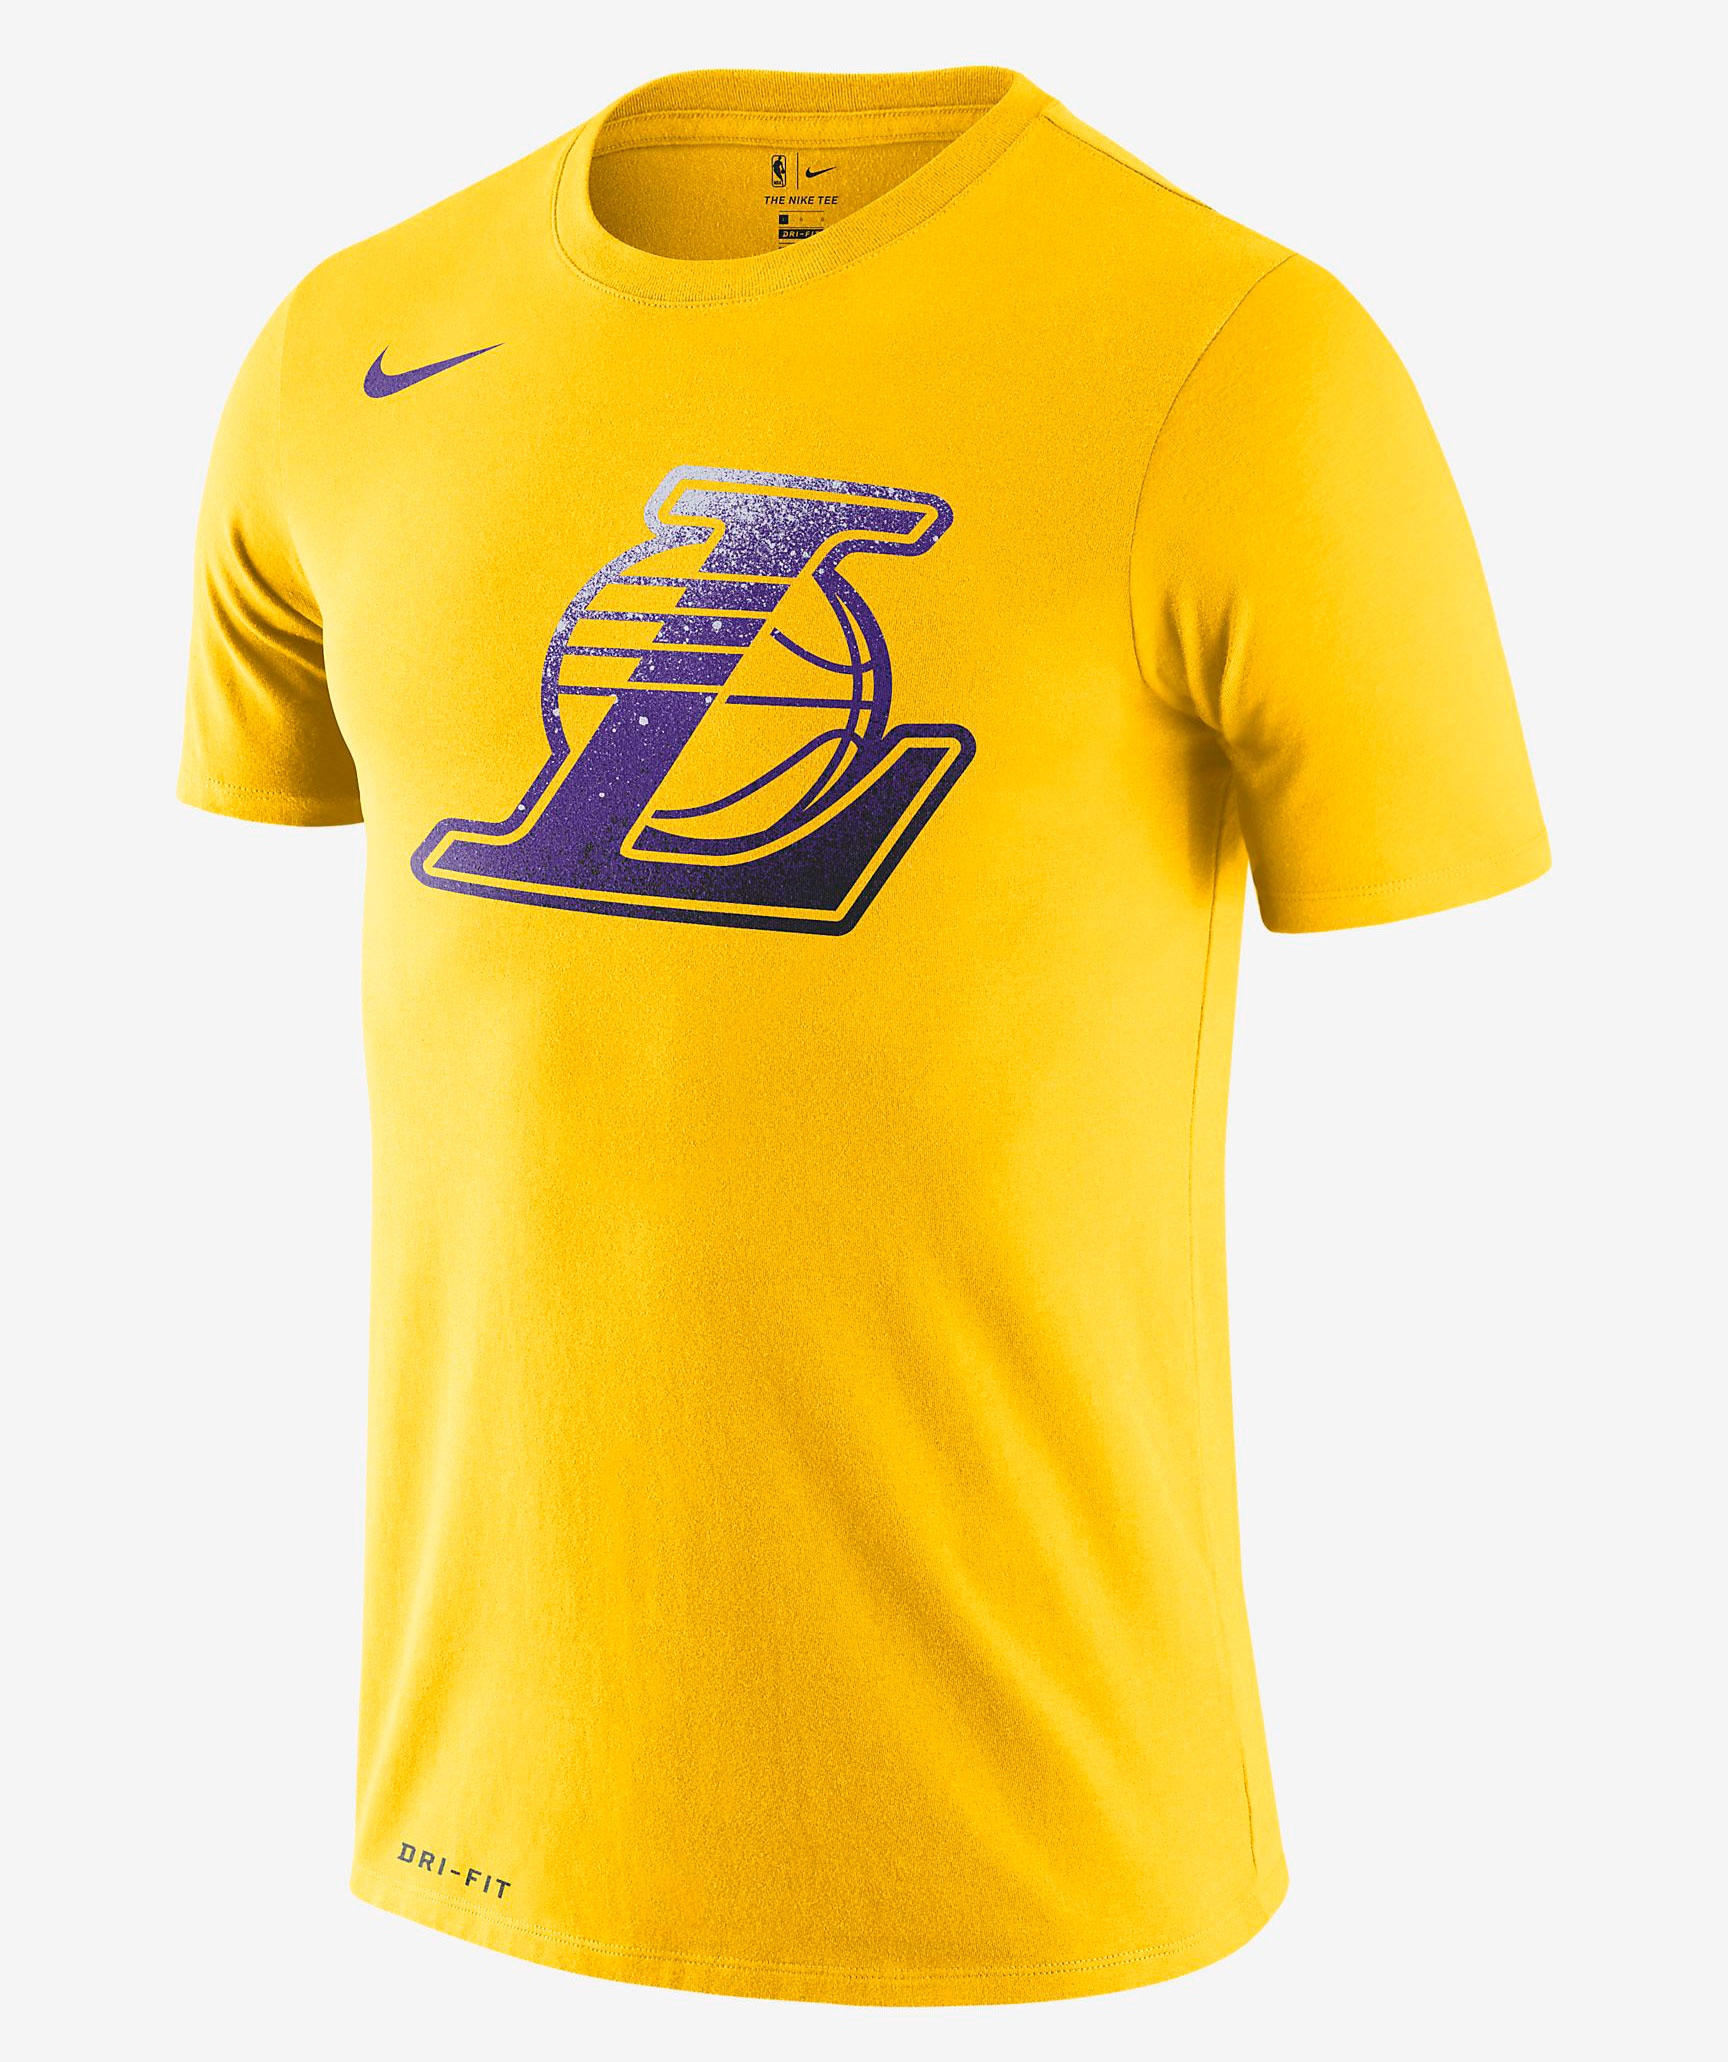 nike-lebron-17-lakers-low-shirt-1